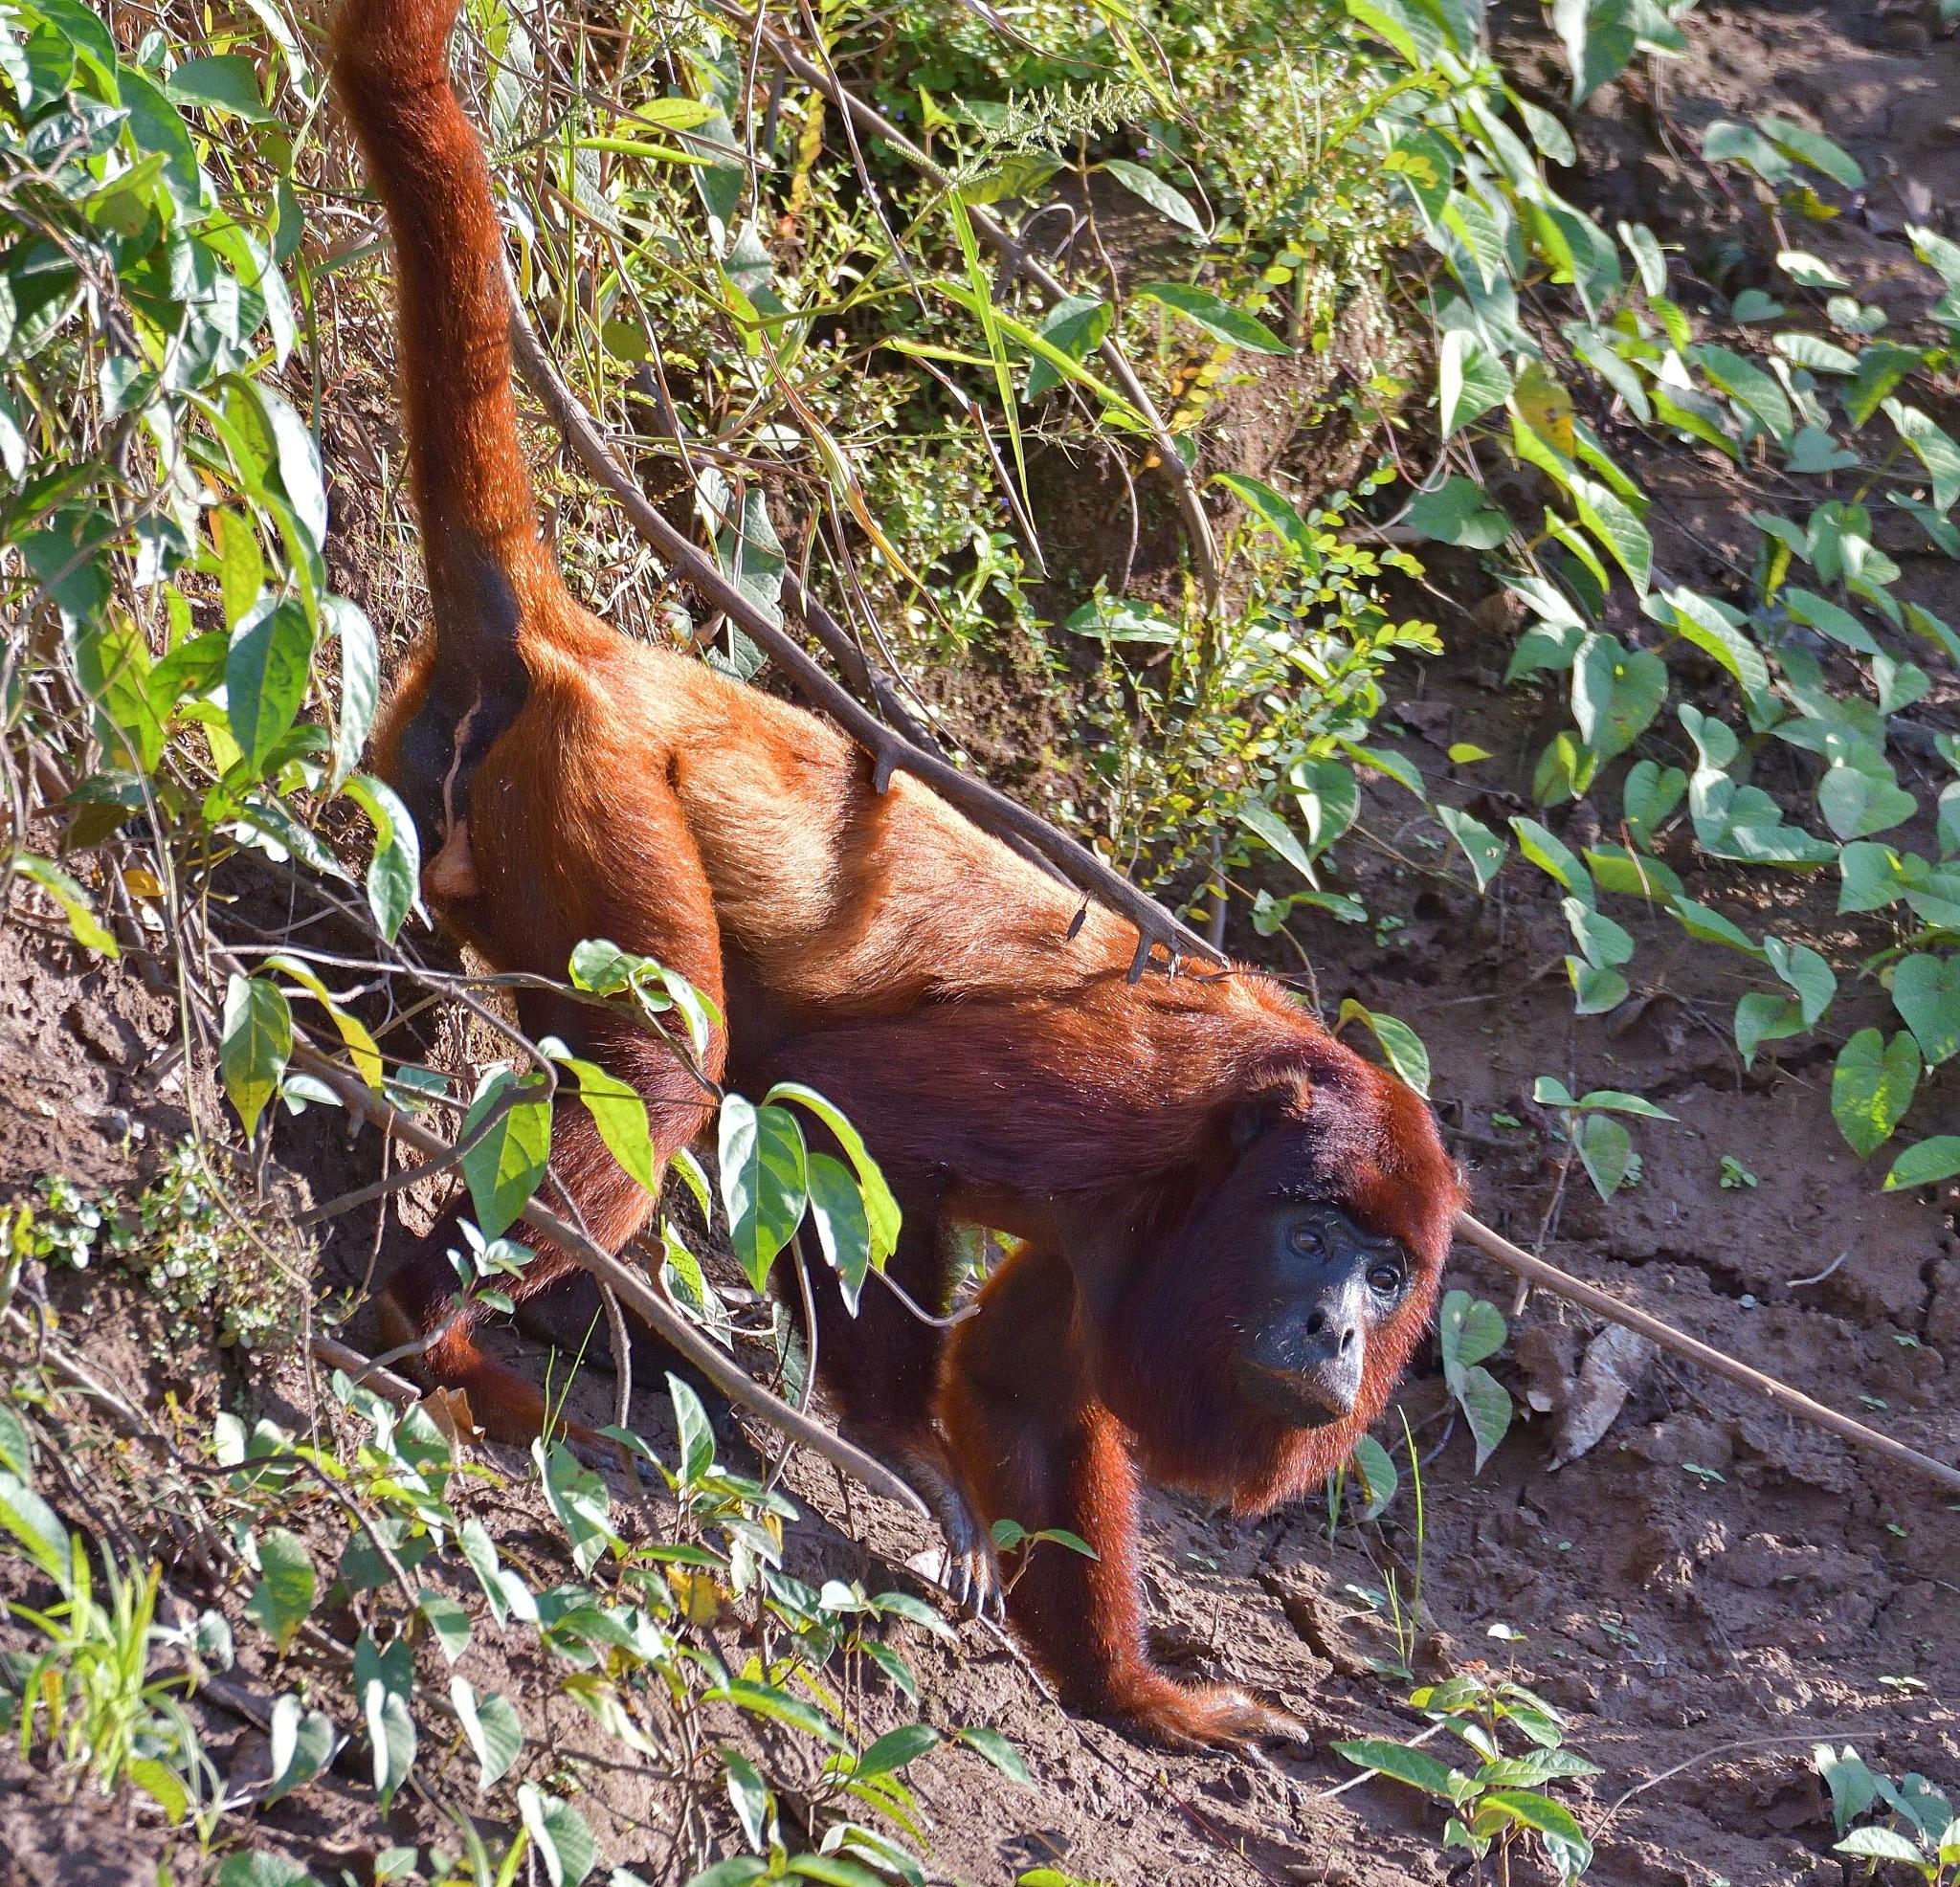 Howler monkey near the riverside by Ton Bos